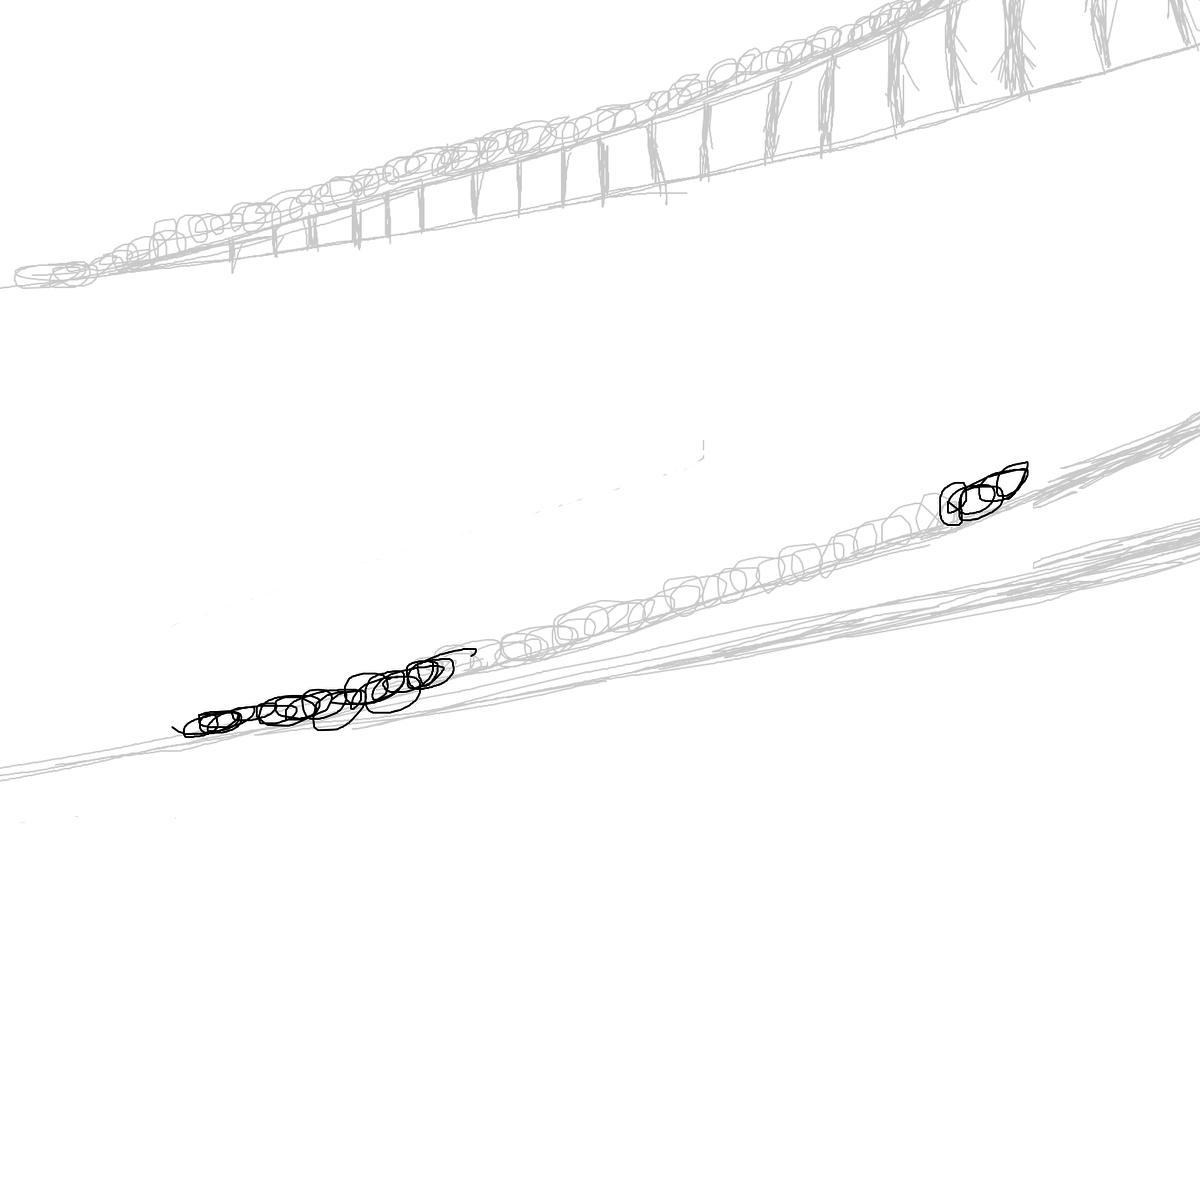 BAAAM drawing#5027 lat:78.7422485351562500lng: -18.1121883392334000